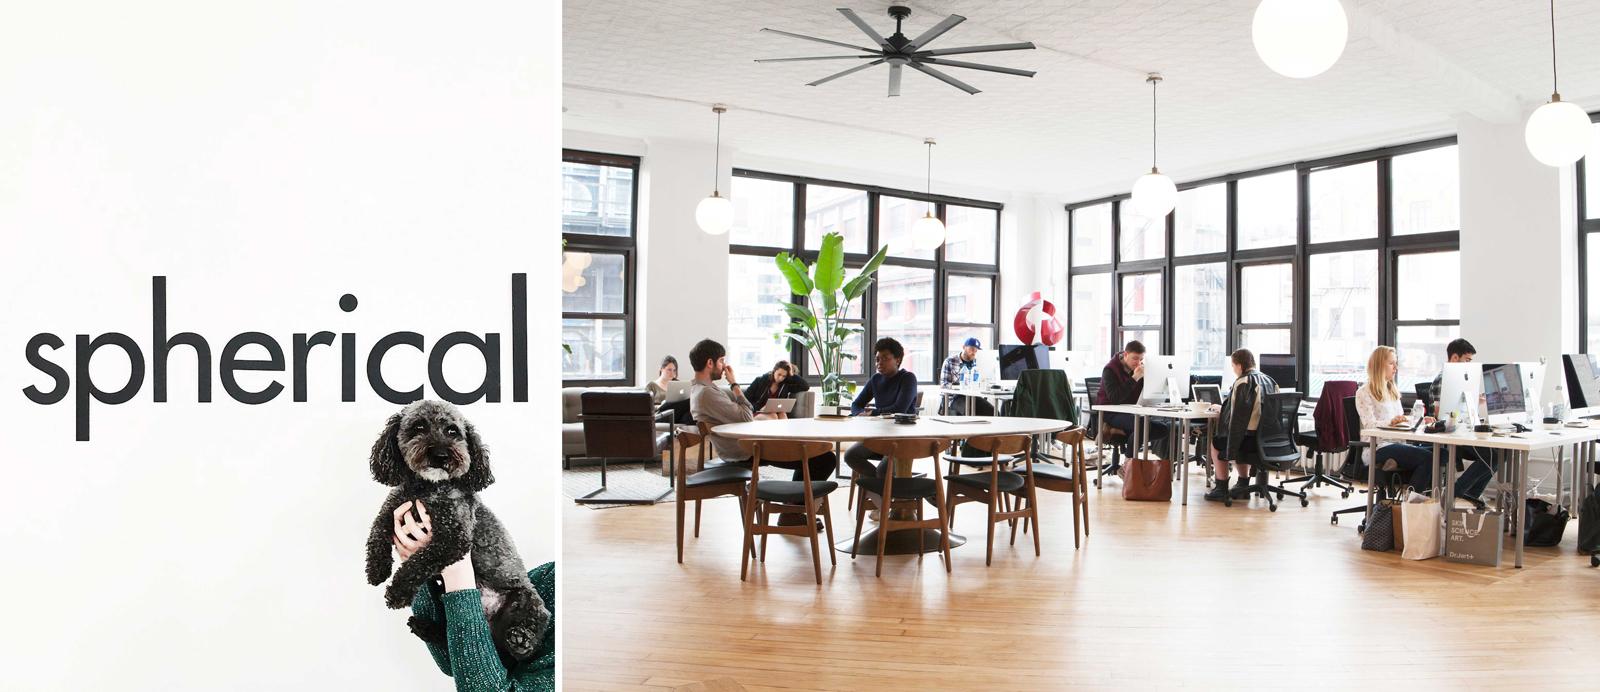 spherical-team-office